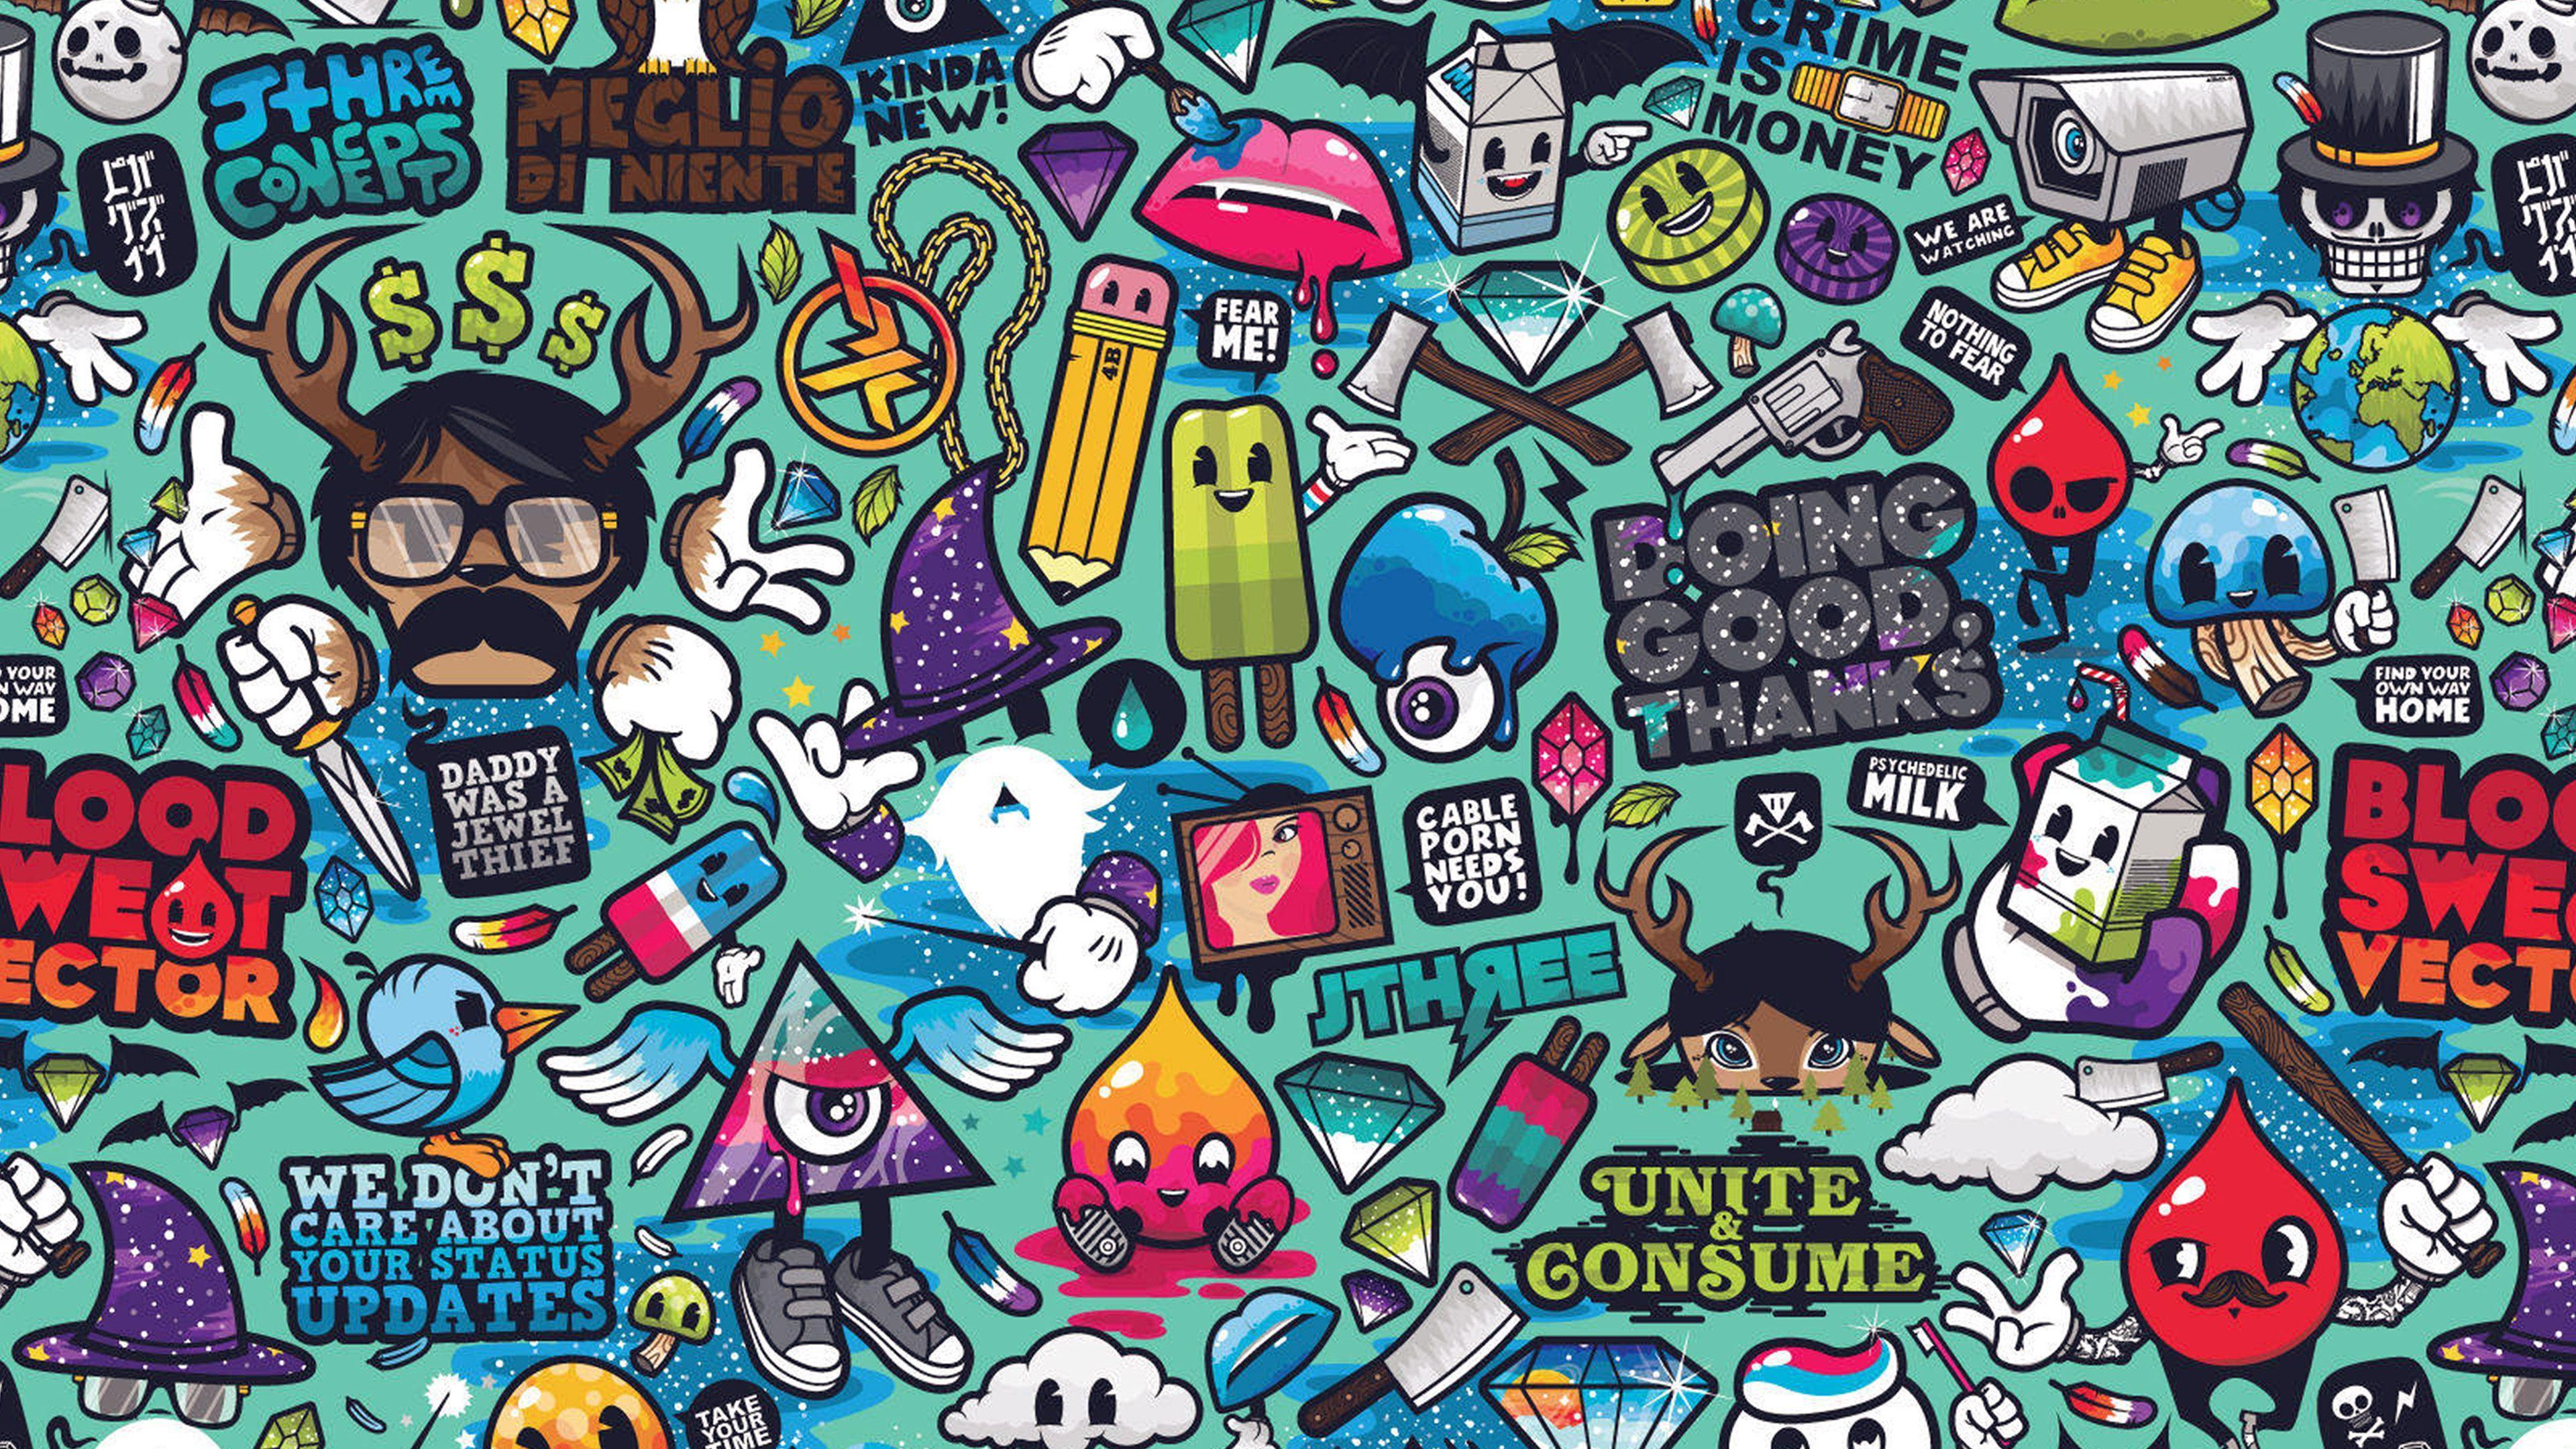 Graffiti 4k Wallpapers - Top Free Graffiti 4k Backgrounds ...